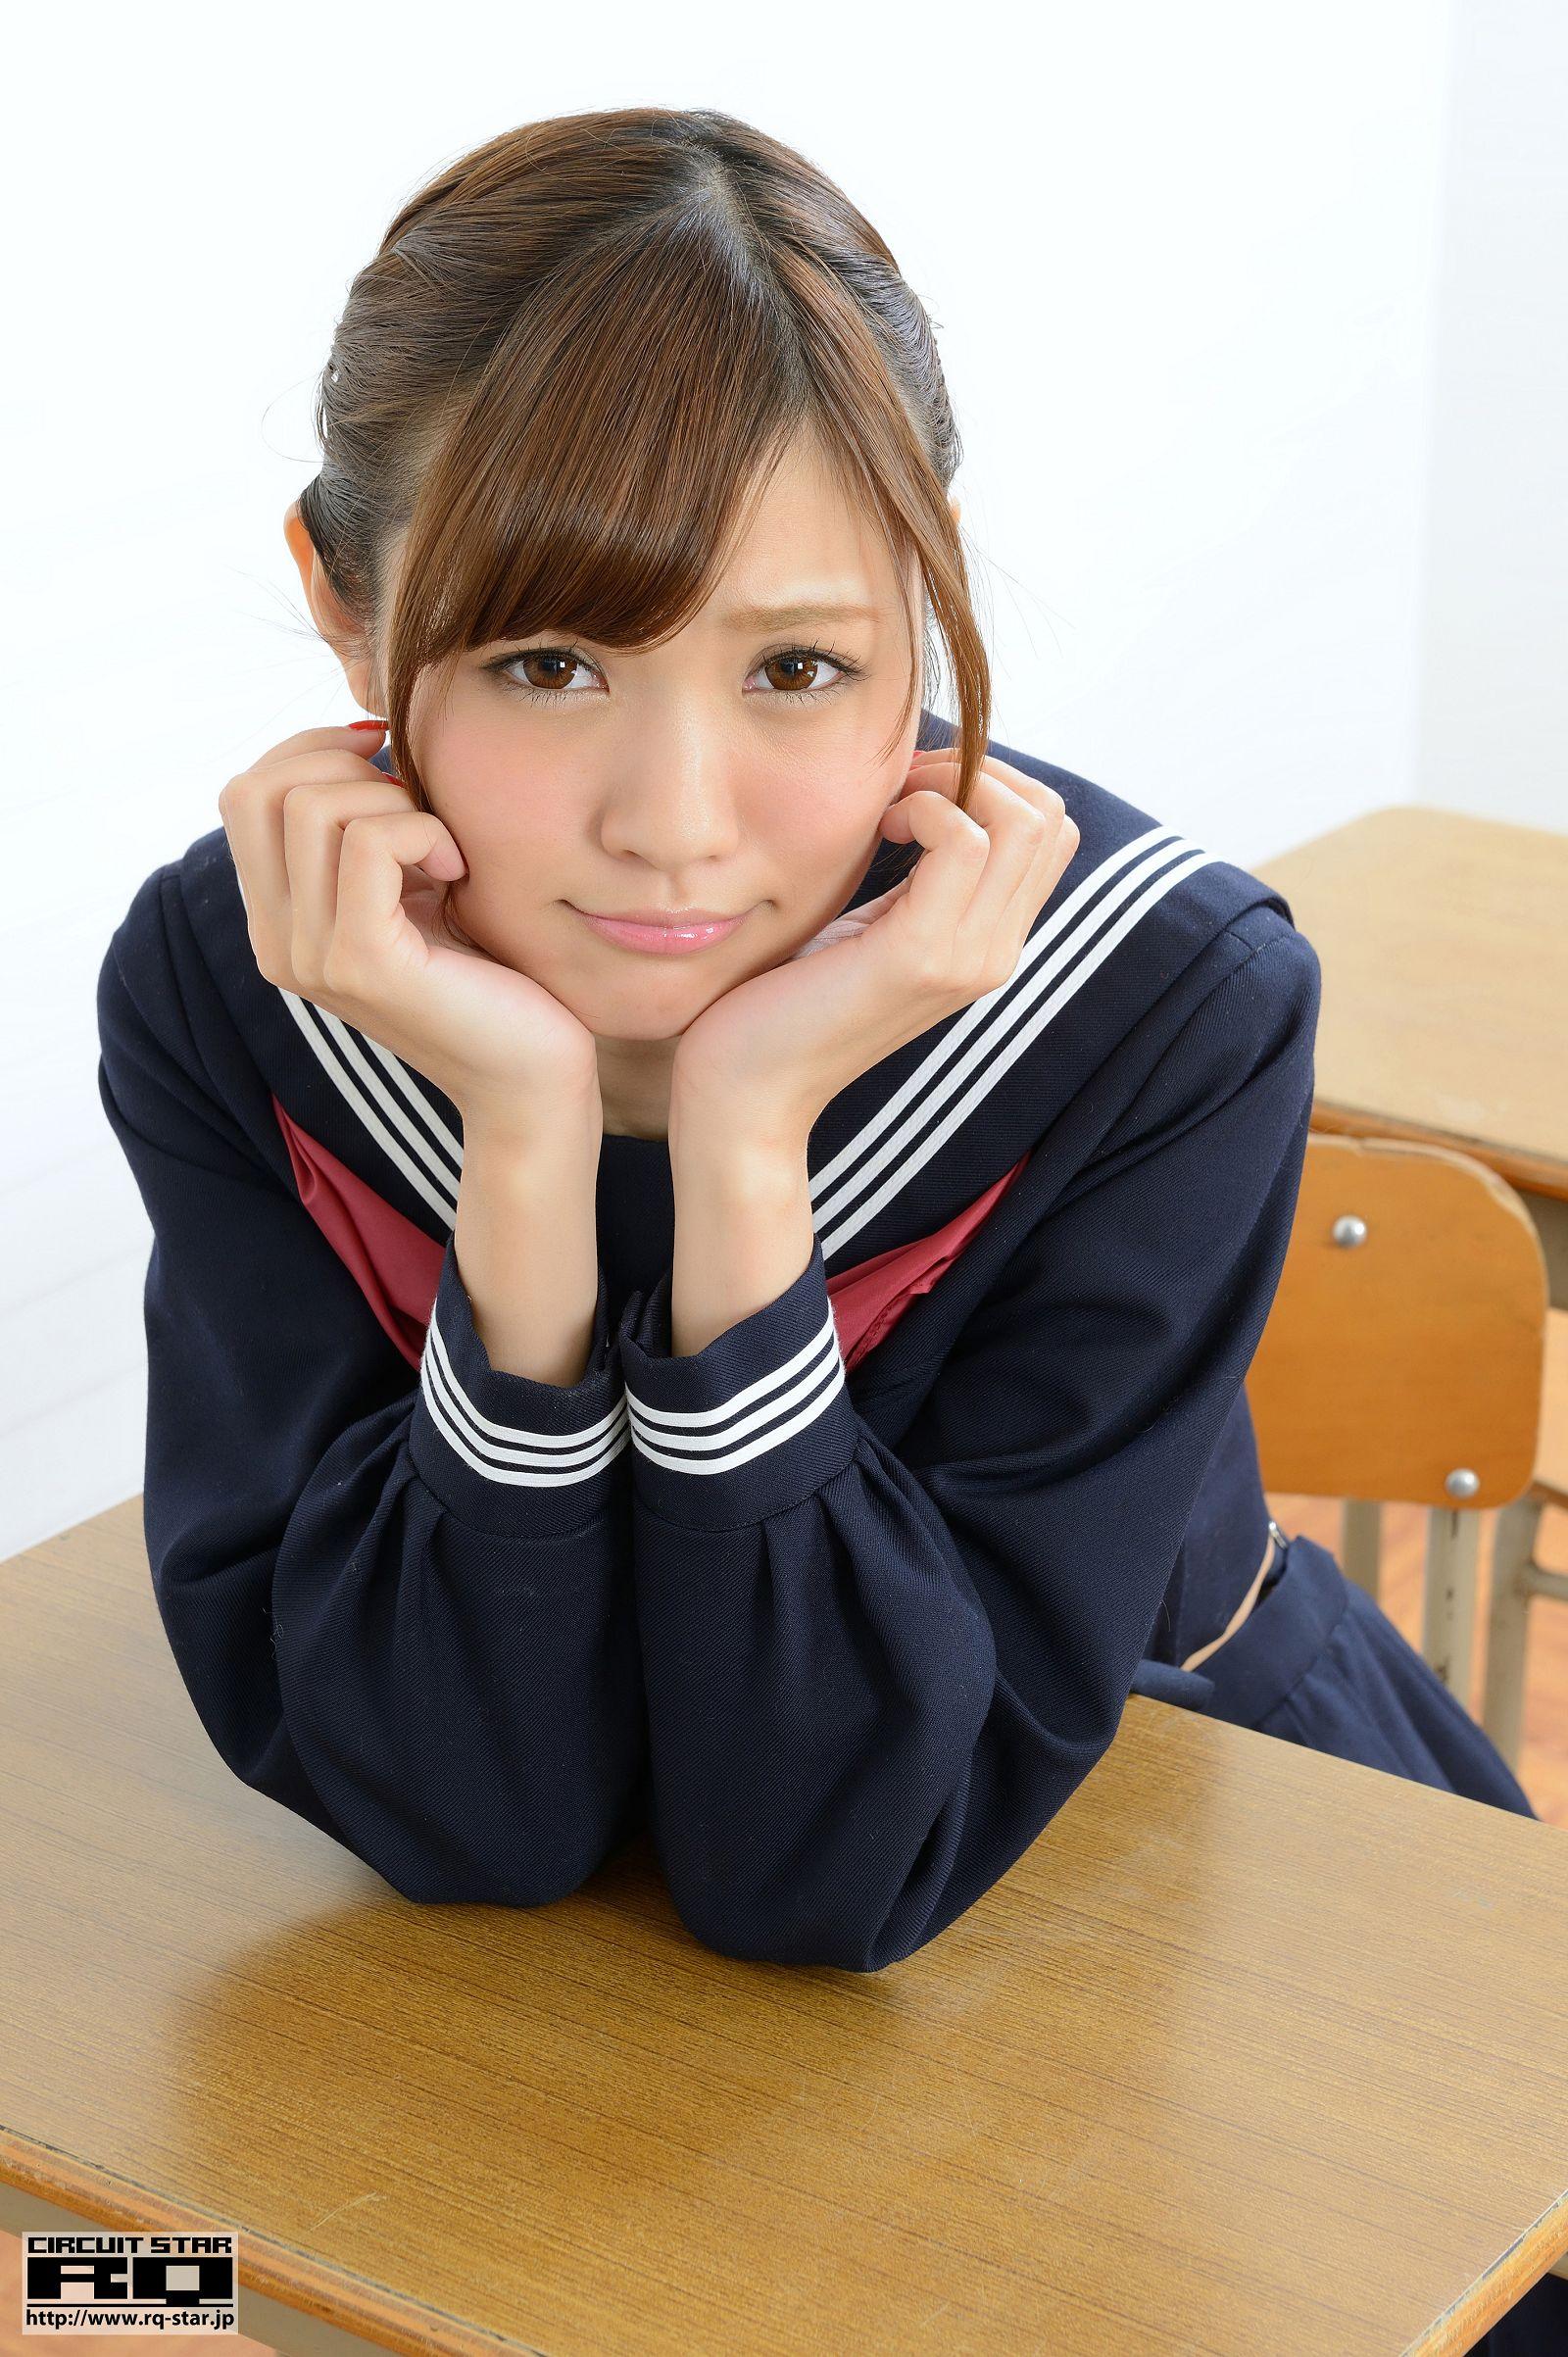 [RQ STAR美女] NO.00876 Haruka Kanzaki 神咲はるか School Girl[80P] RQ STAR 第3张